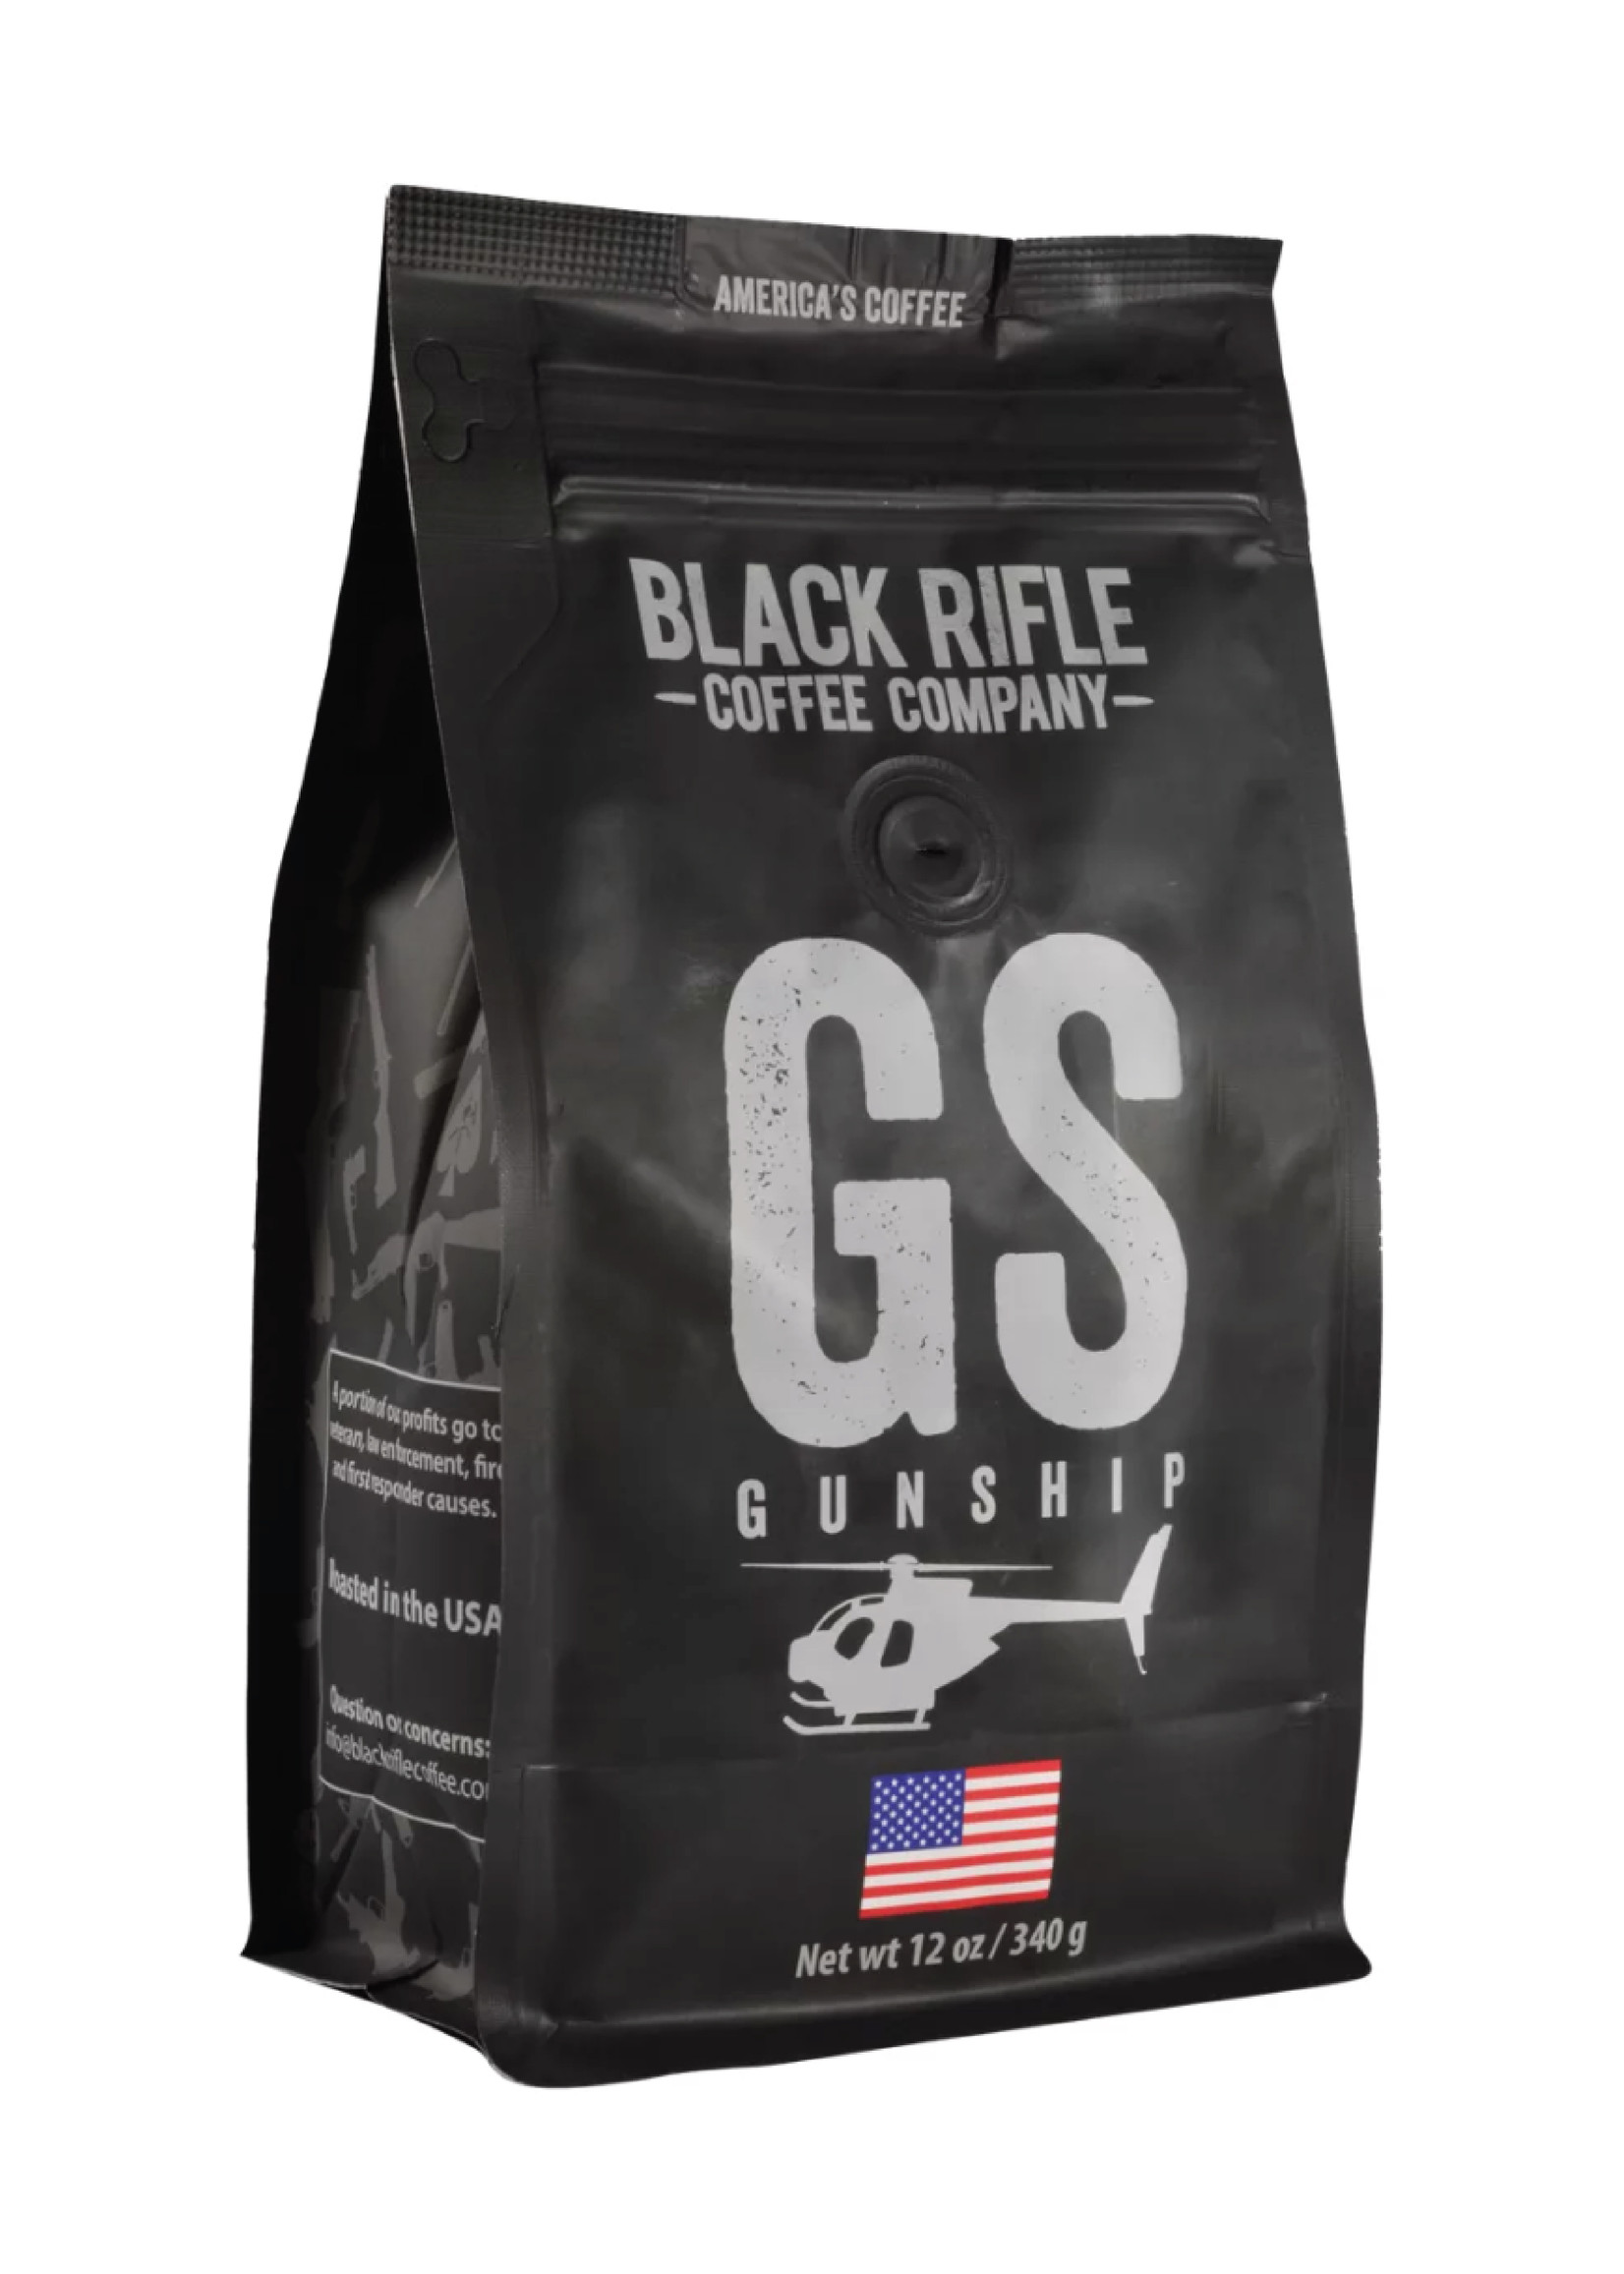 Black Rifle Coffee Company Black Rifle Coffee Company Gunship Coffee Roast Whole Bean